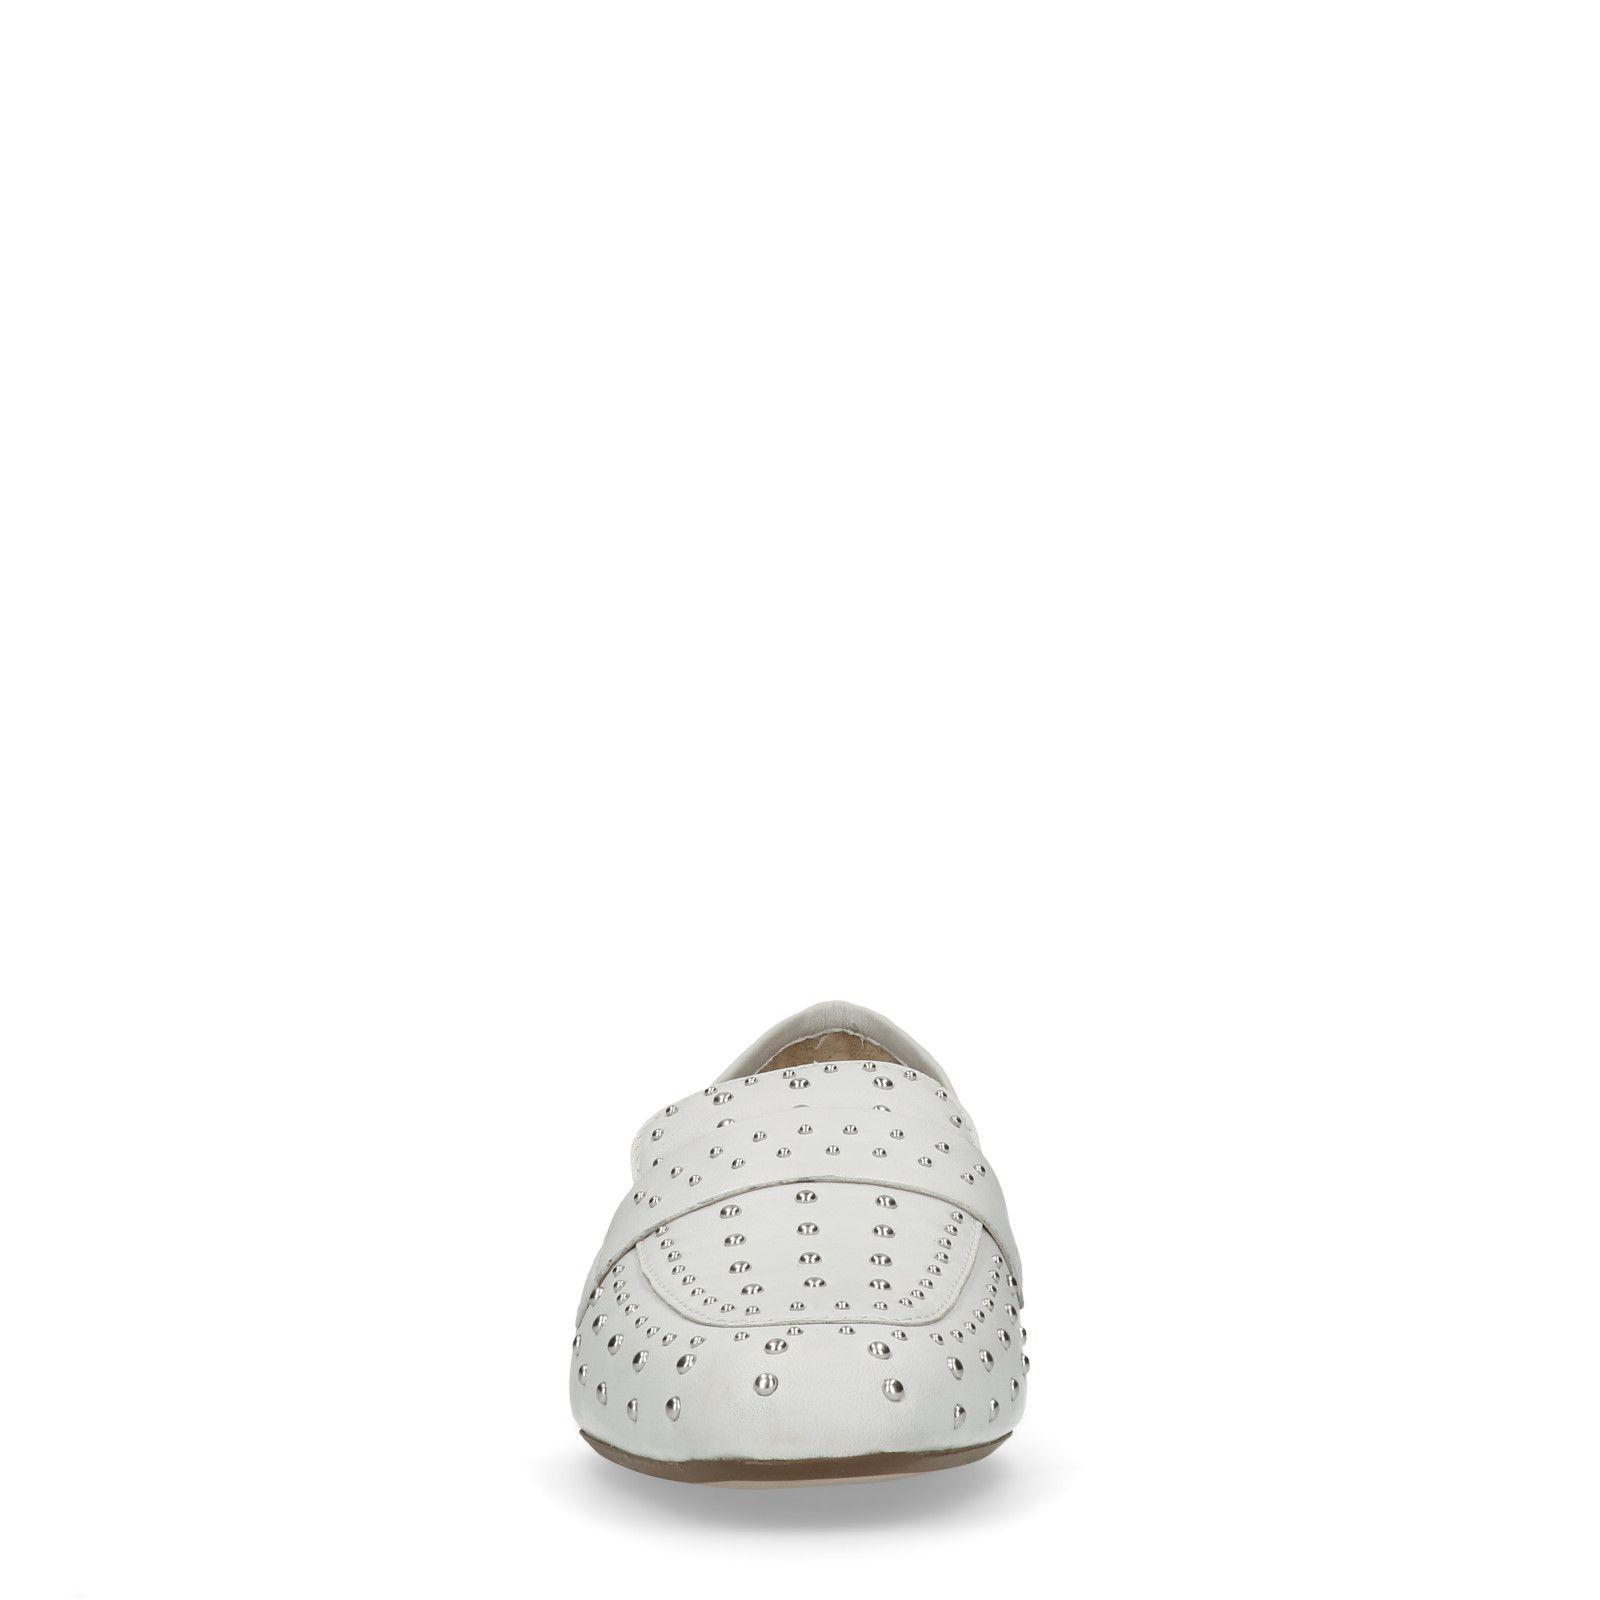 98927b6282d Manfield Witte loafers met studs. sale. prev